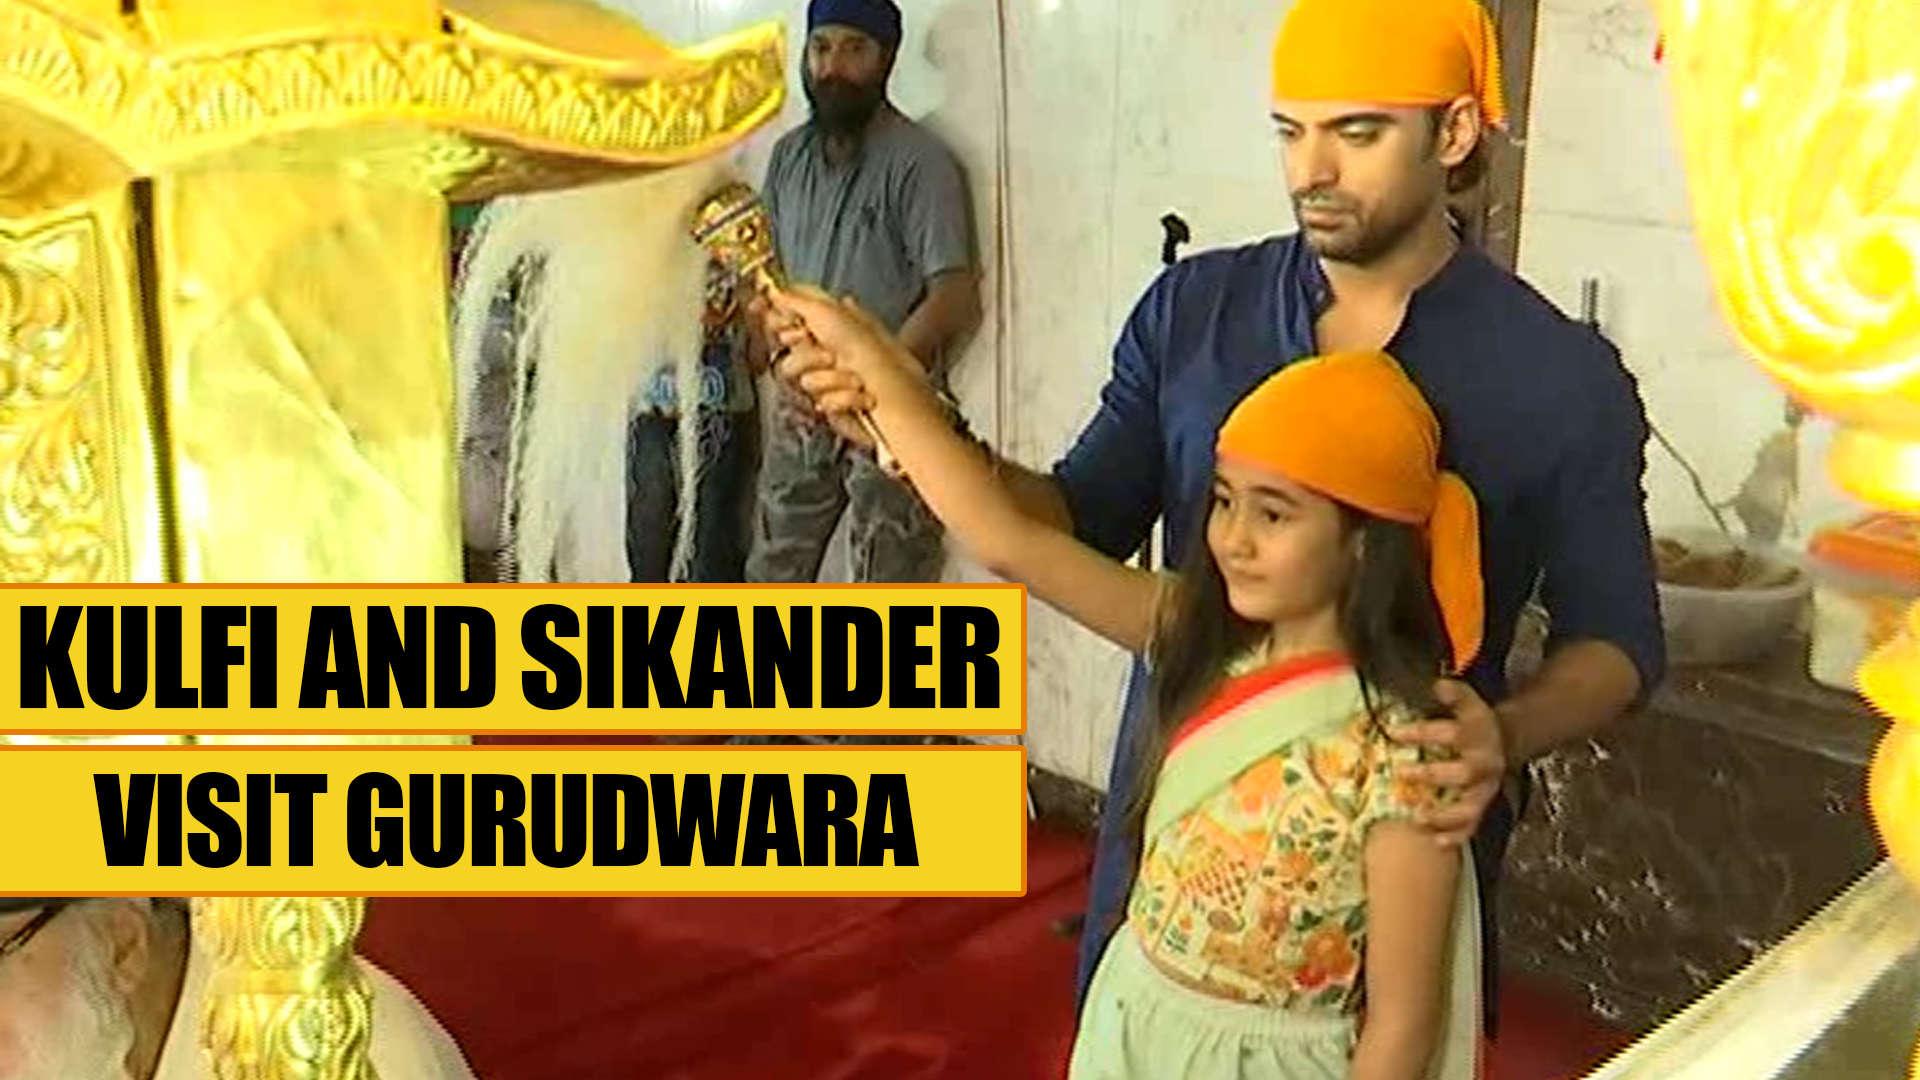 Kulfi Kumar Bajewala's Kulfi and Sikander visit Gurudwara to seek blessings